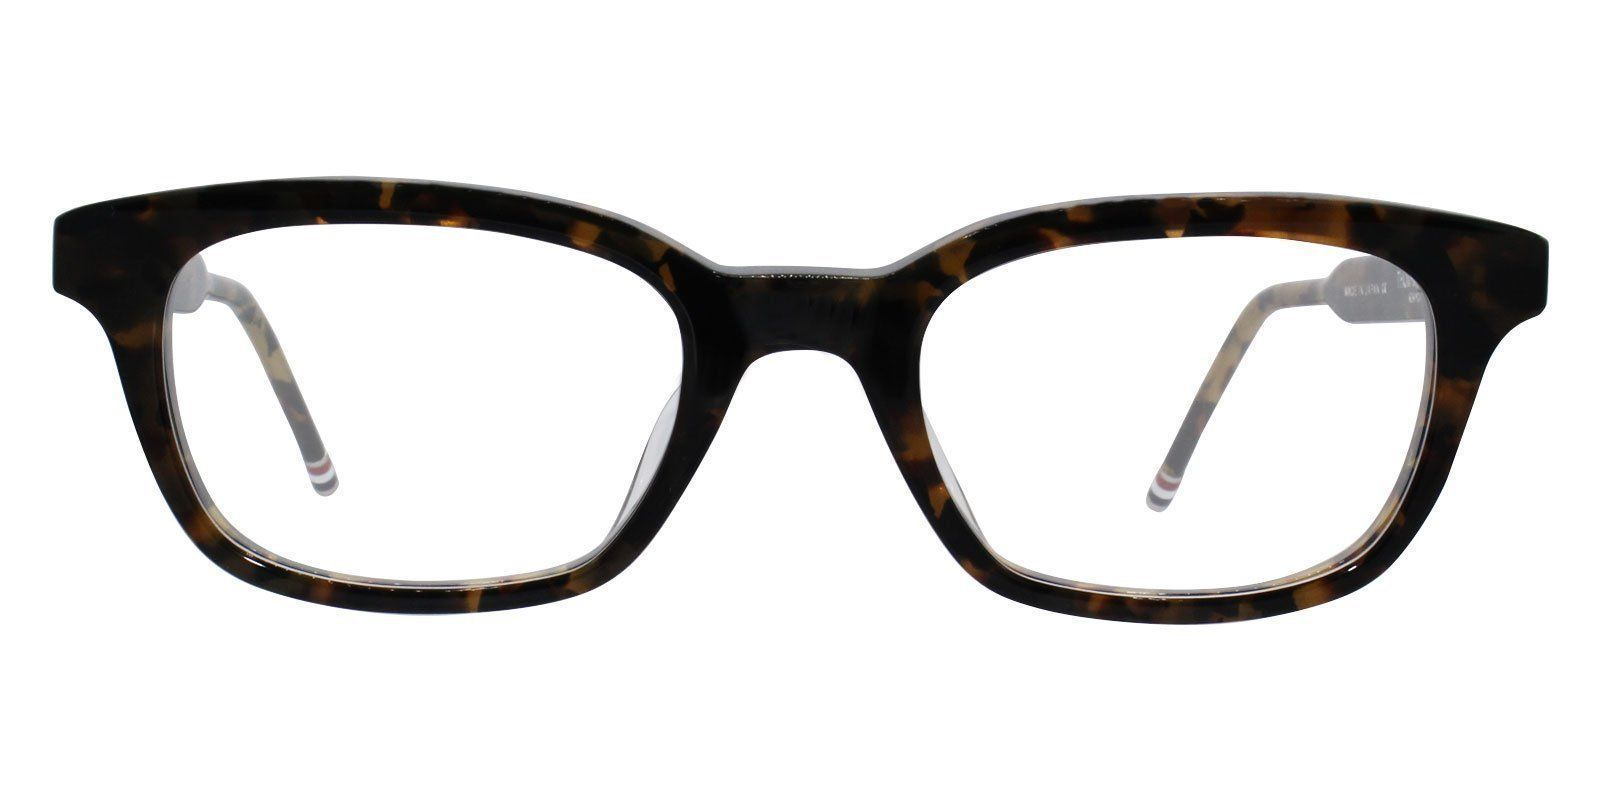 338b97bfd3 Thom Browne - TB-410 Tortoise-eyeglasses-Designer Eyes